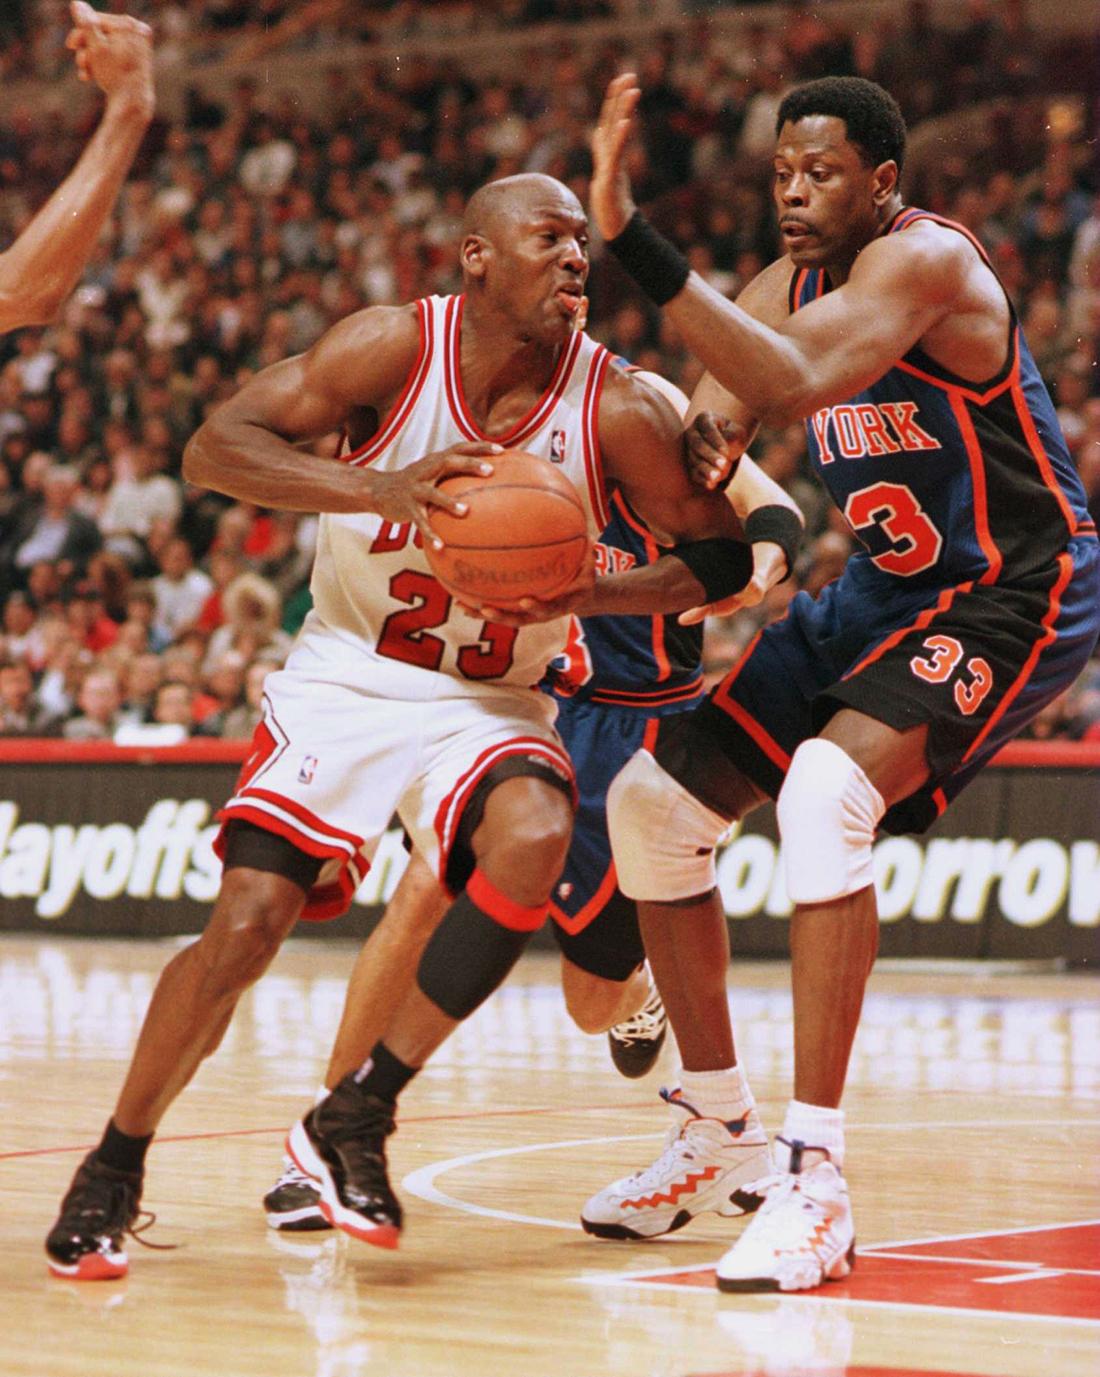 Michael Jordan & Patrick Ewing en viva basquet